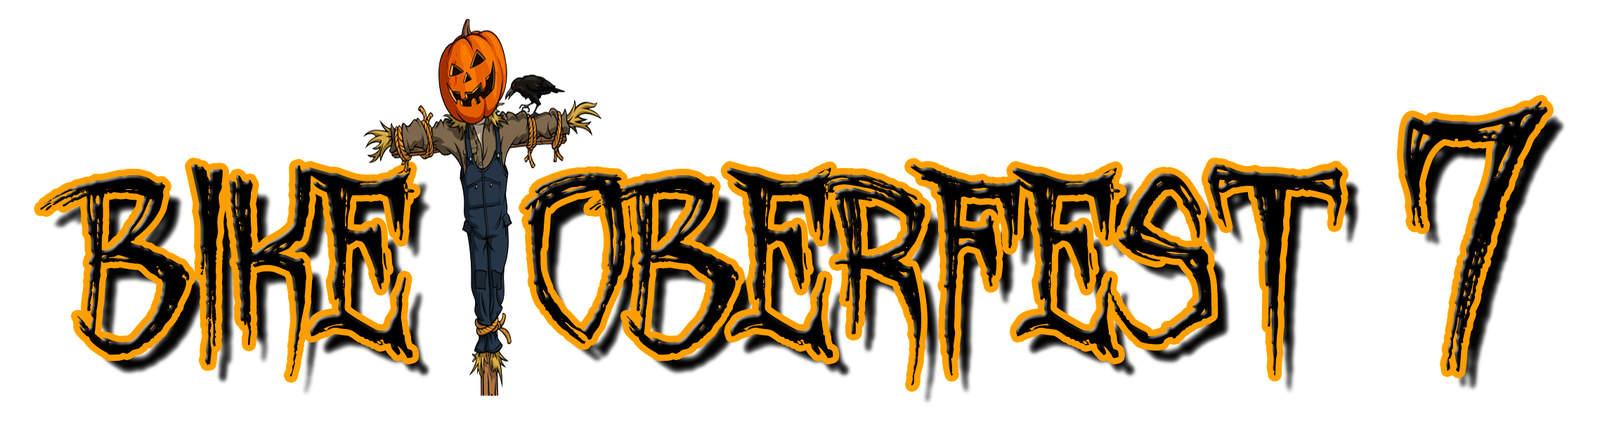 https://s3.amazonaws.com/uploads.bmxmuseum.com/user-images/142962/biketoberfest-logo-257bcc8fc60.jpg